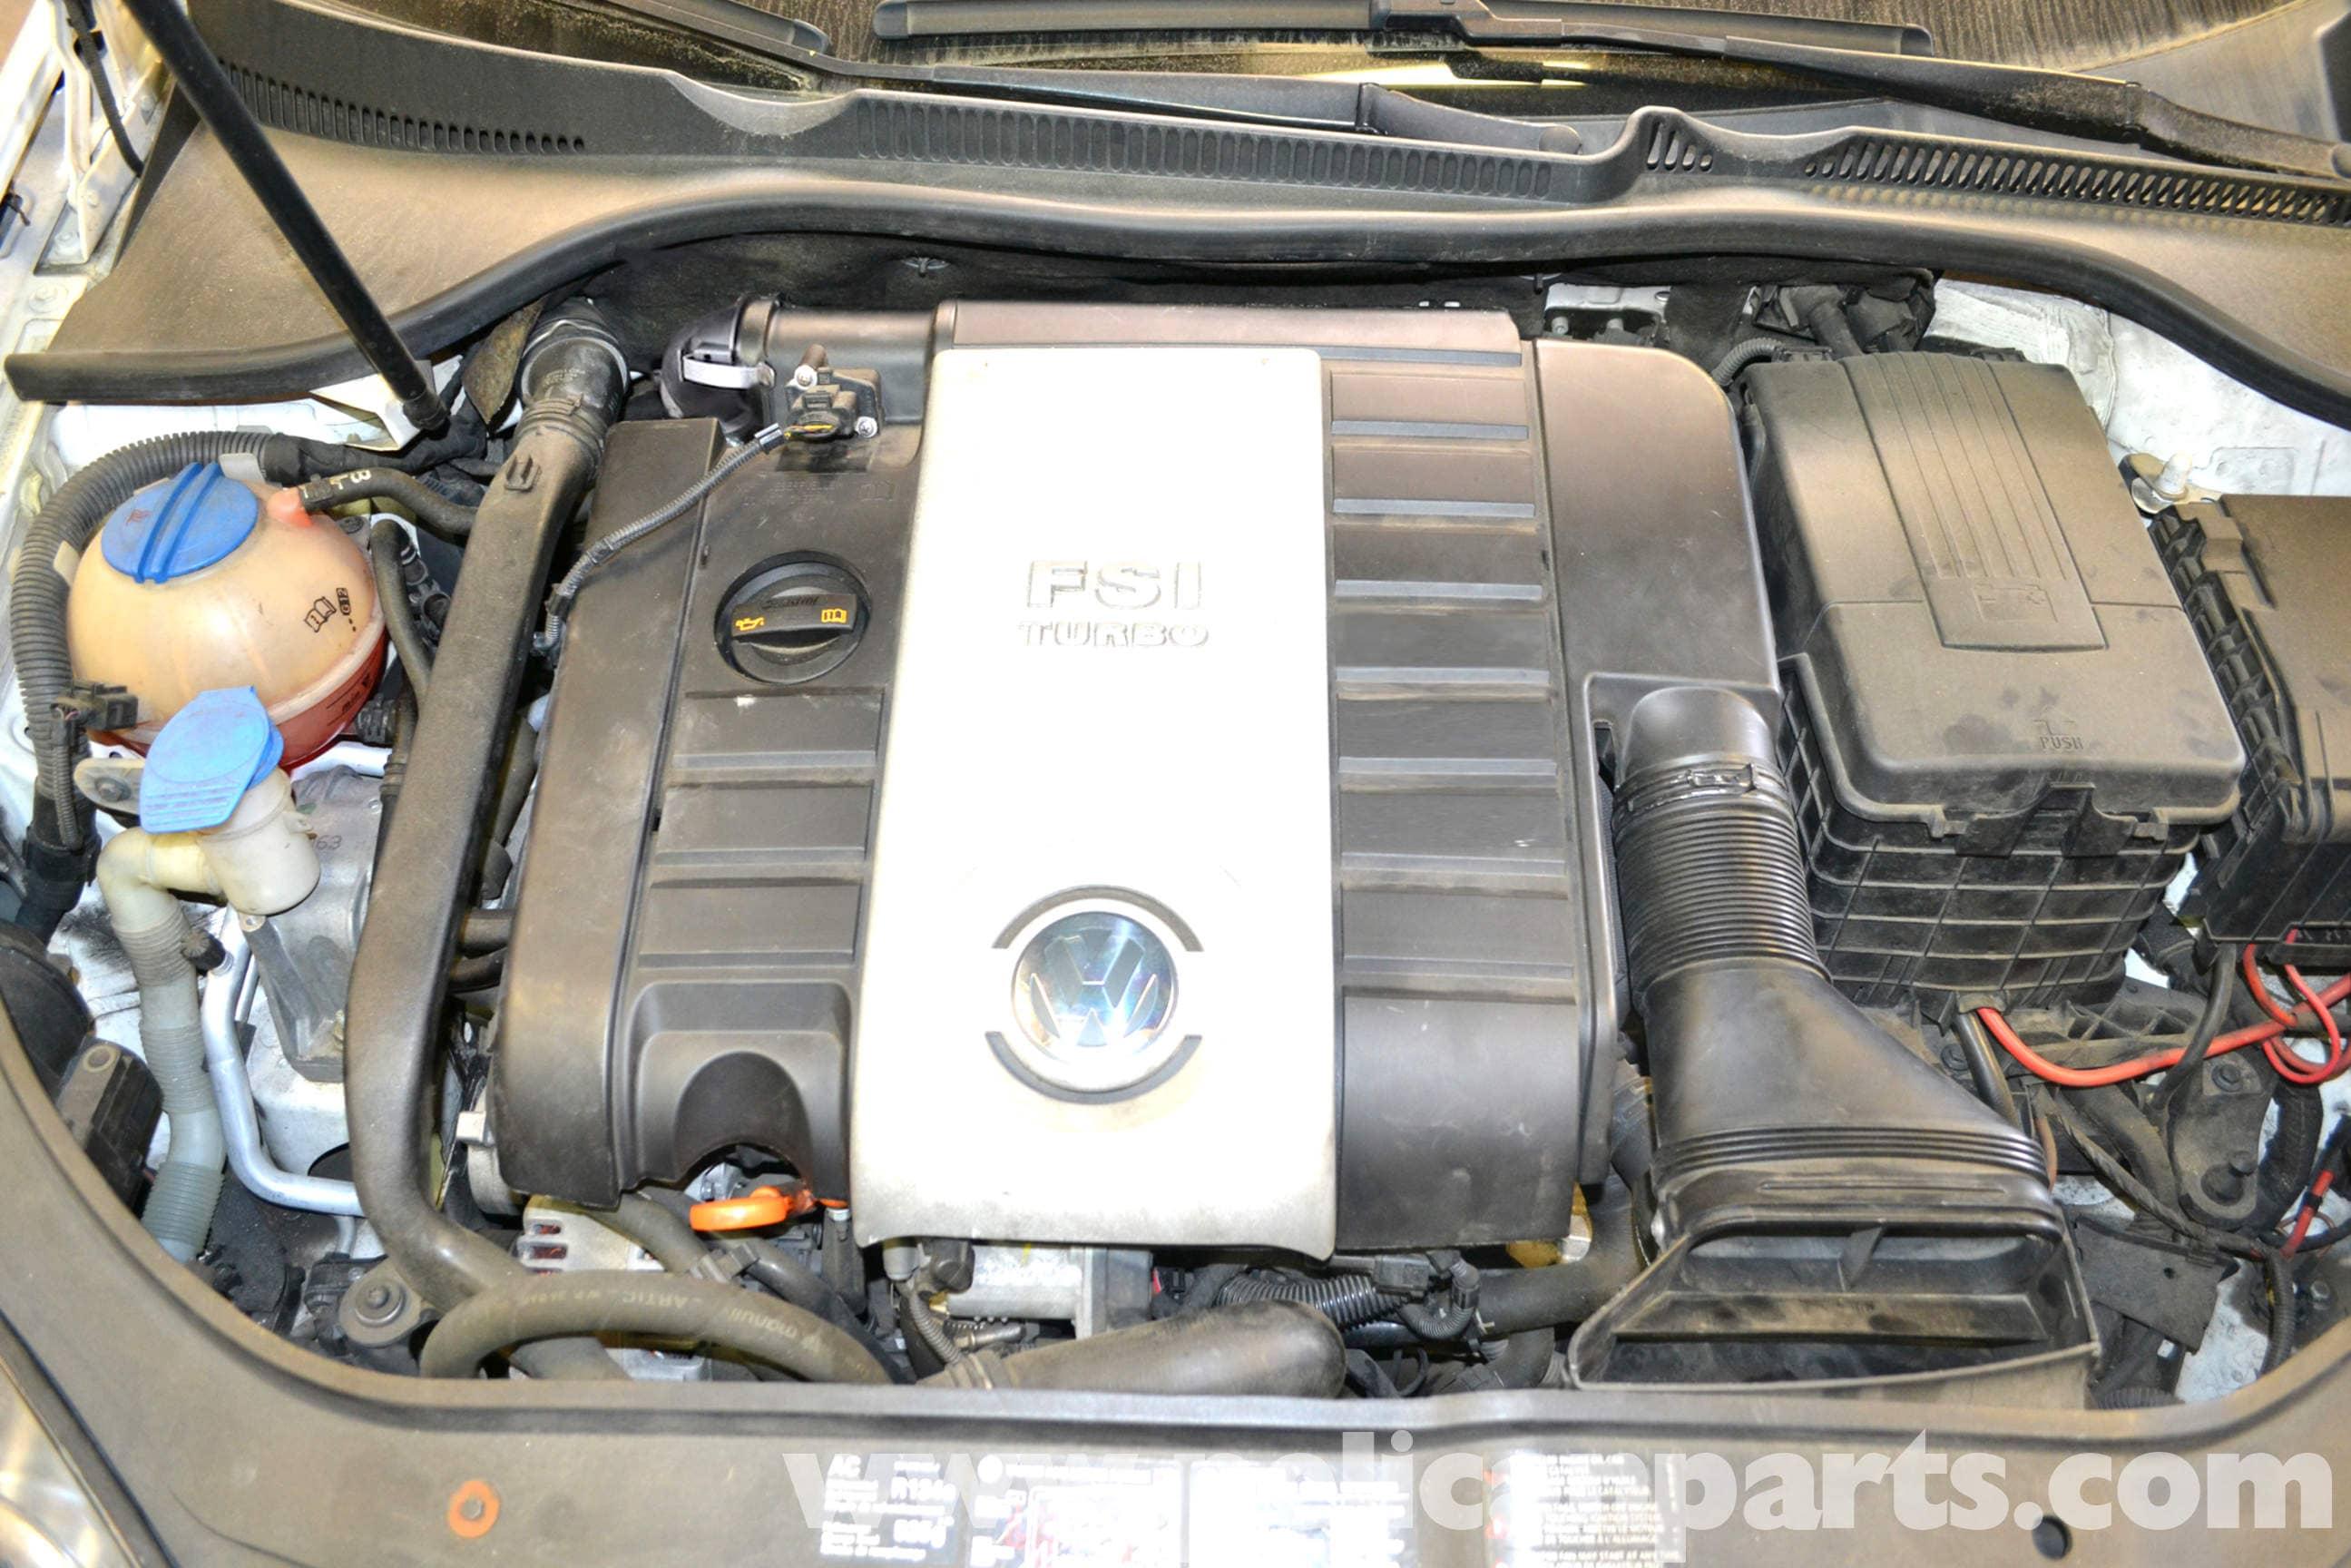 Exterior Volkswagen Engine Cover Diagram Wiring Diagrams Battery As Well 2006 Vw Passat 2 0 U2022 Rh Autonomia Co 20 Parts